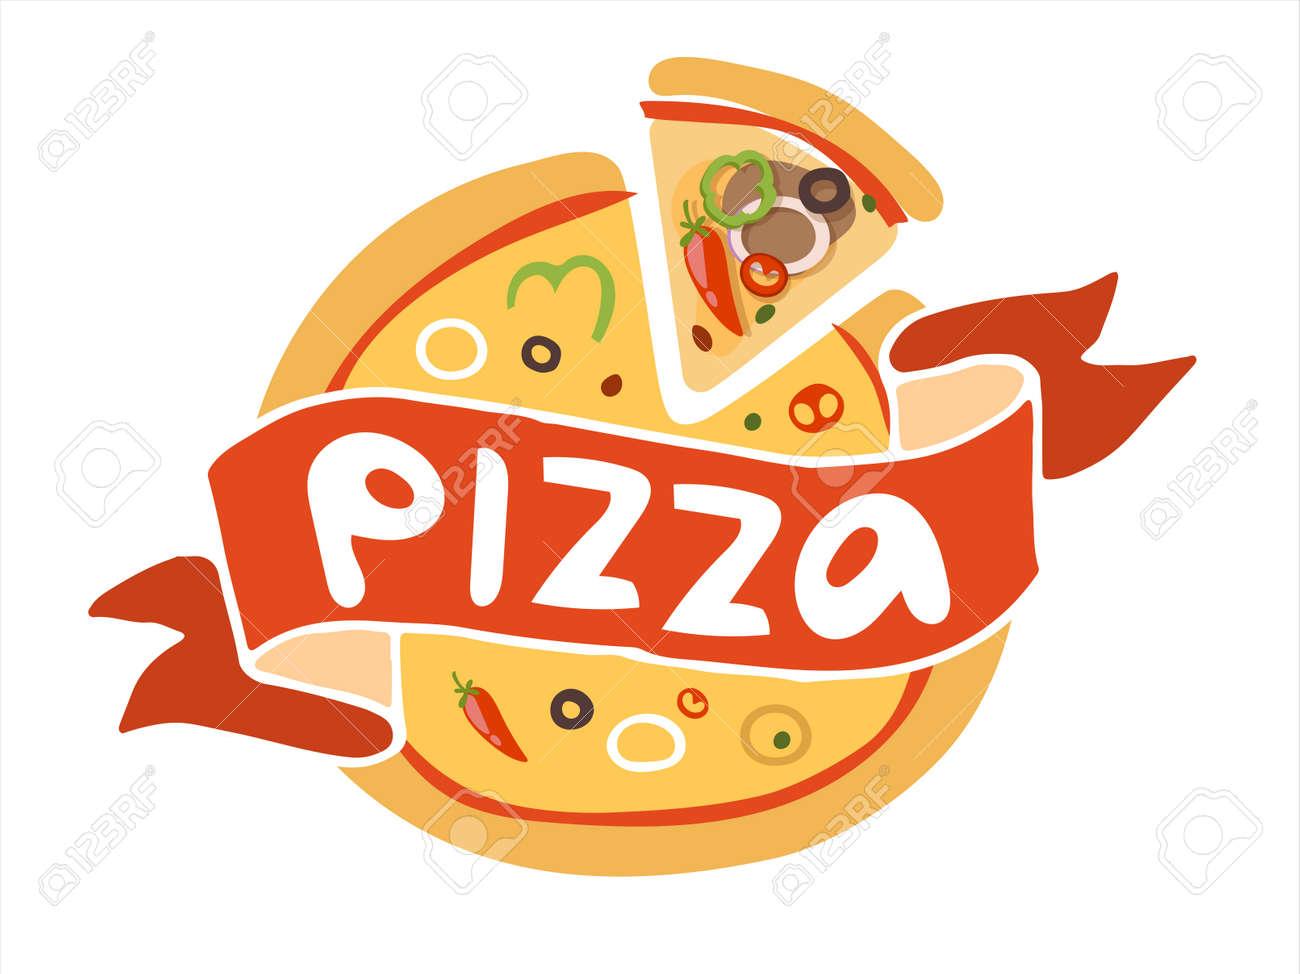 Image result for pizza logo